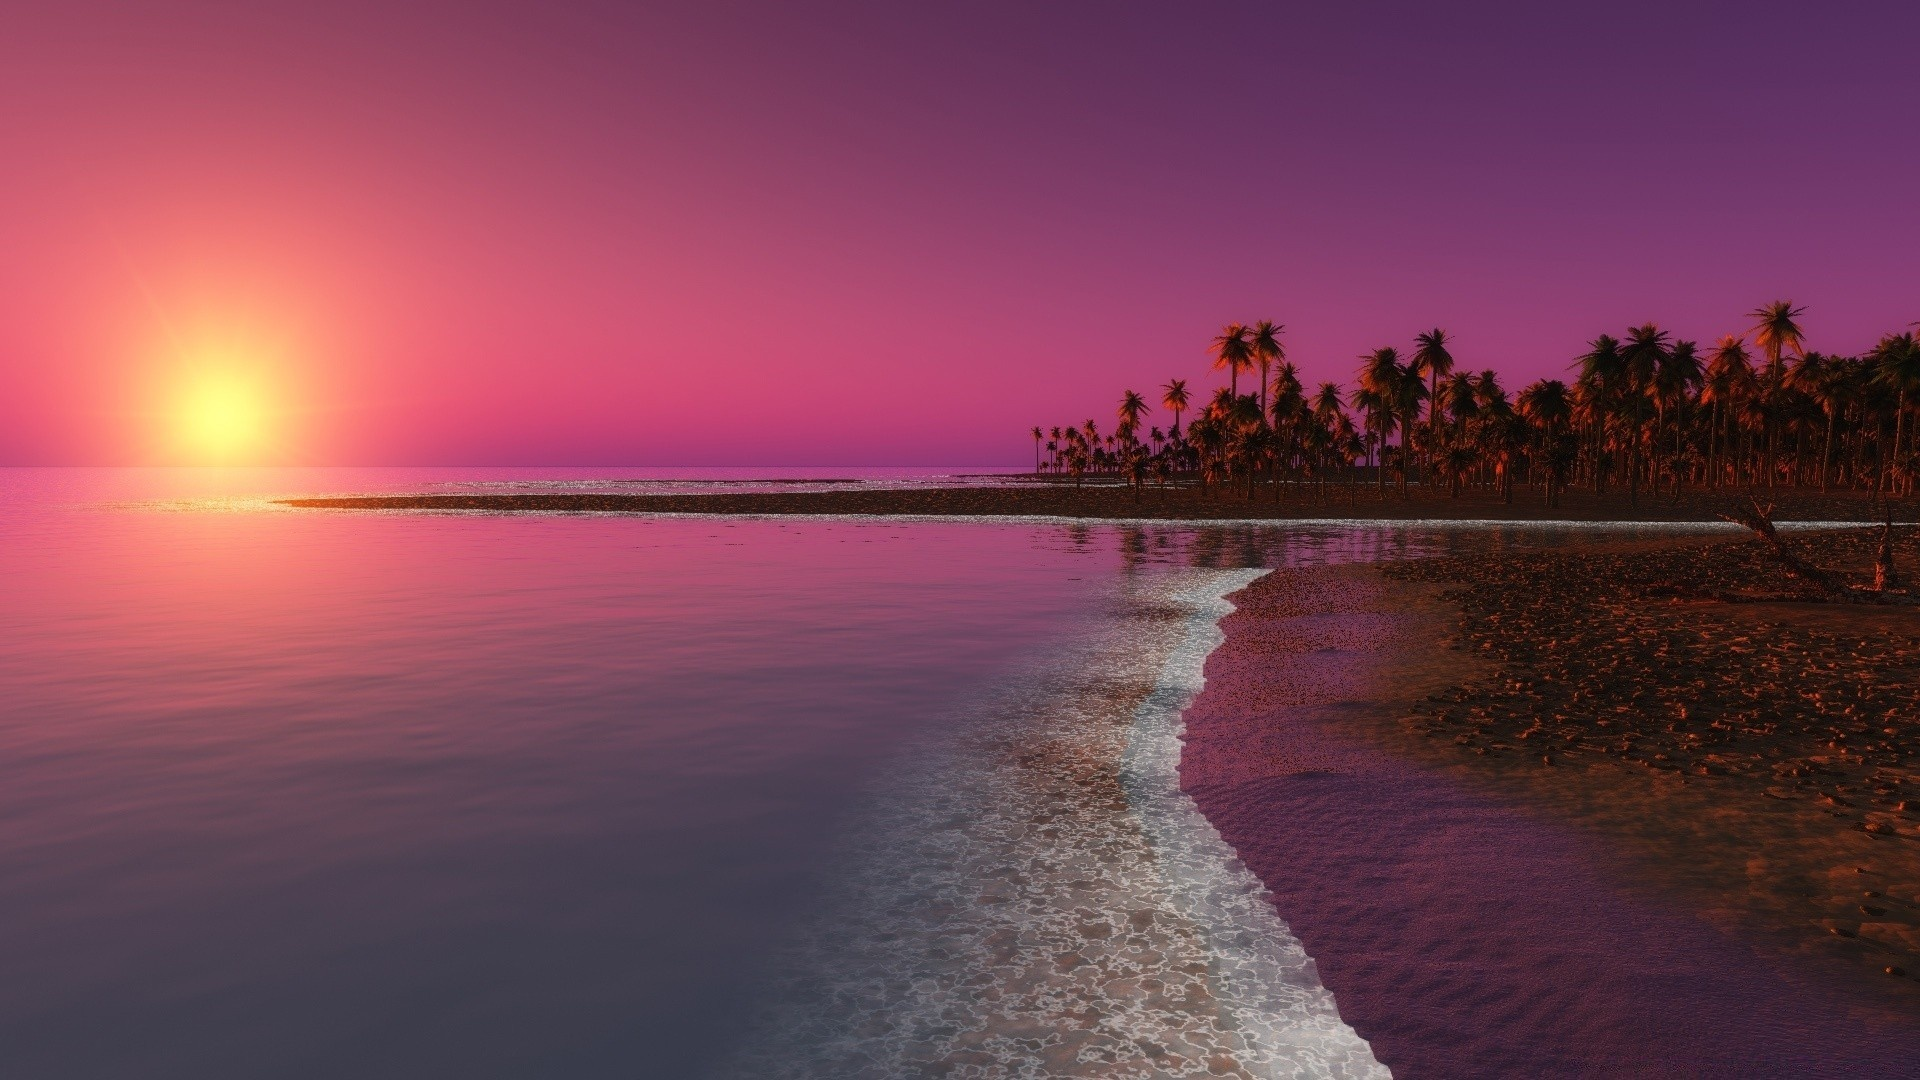 Sunset hd background